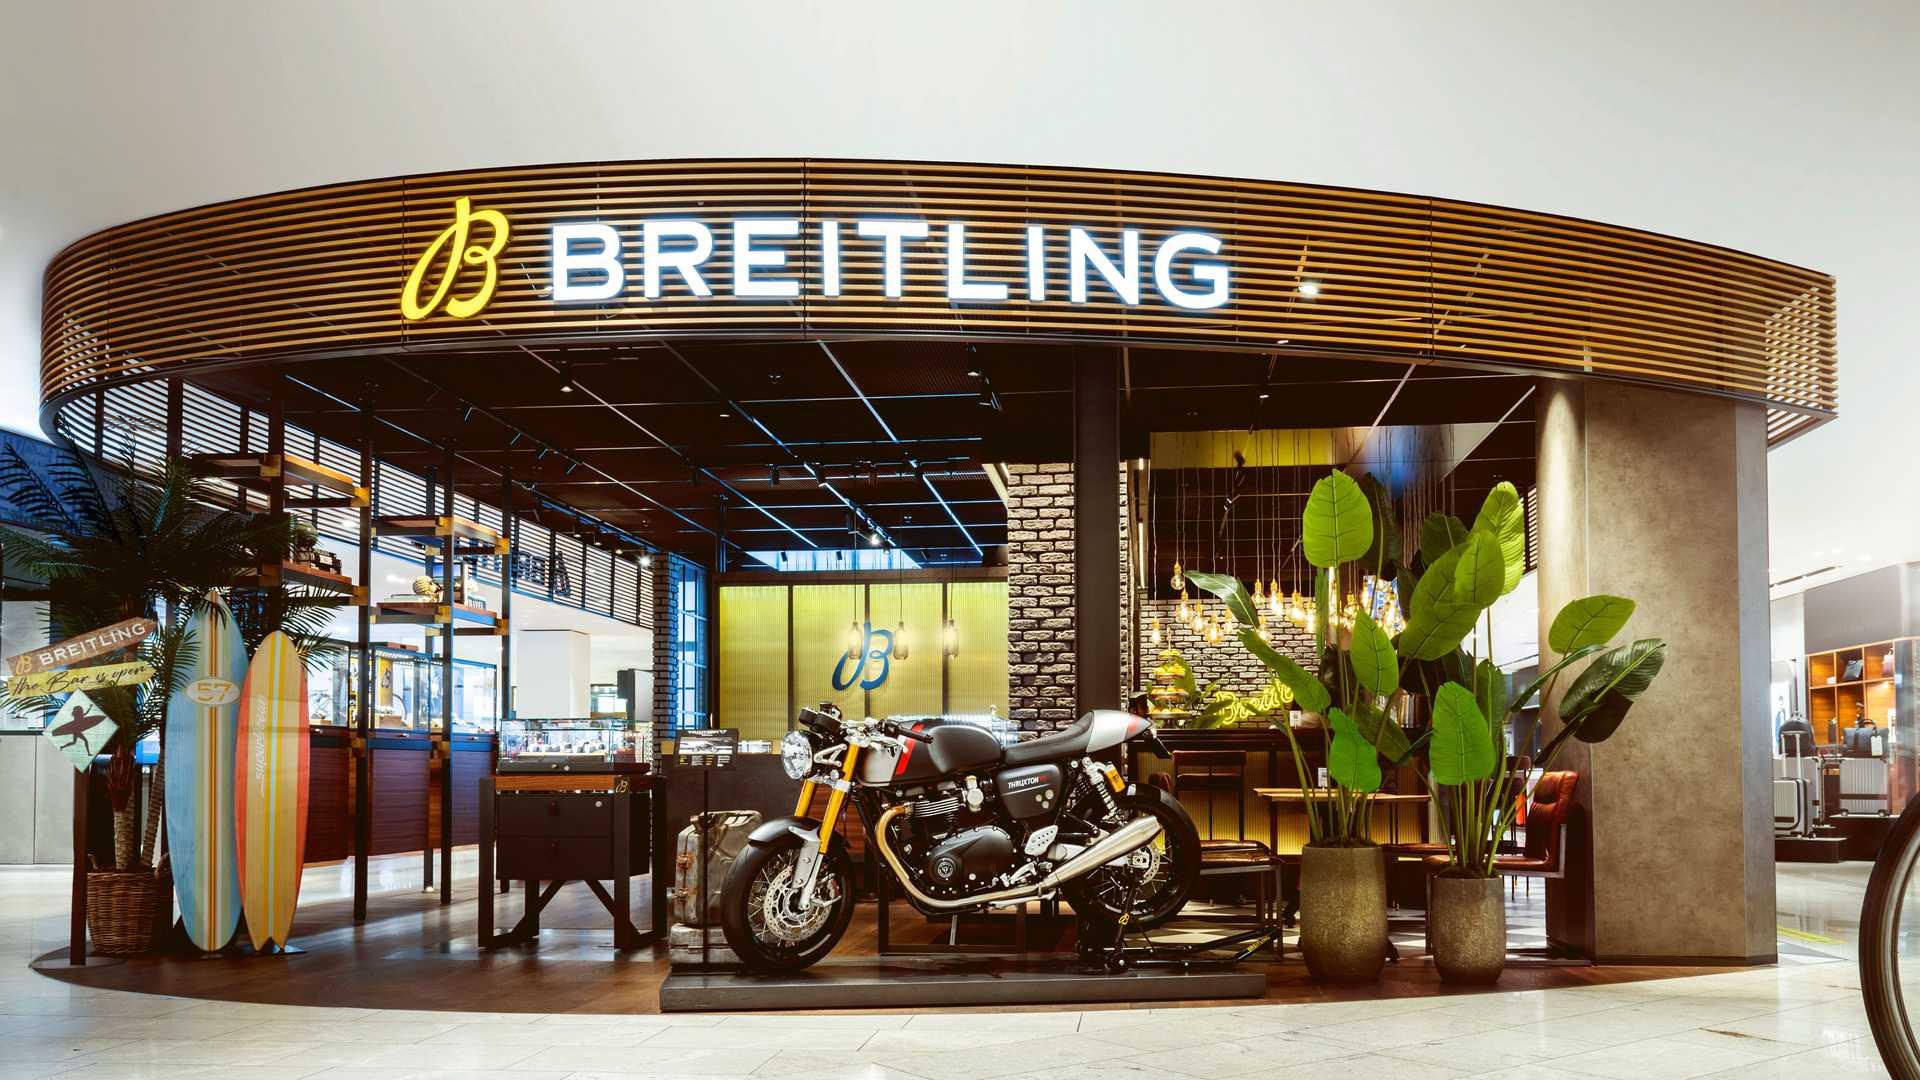 Triumph Motorcycles Breitling 2022,Triumph Motorcycles Breitling,Triumph Breitling, Breitling